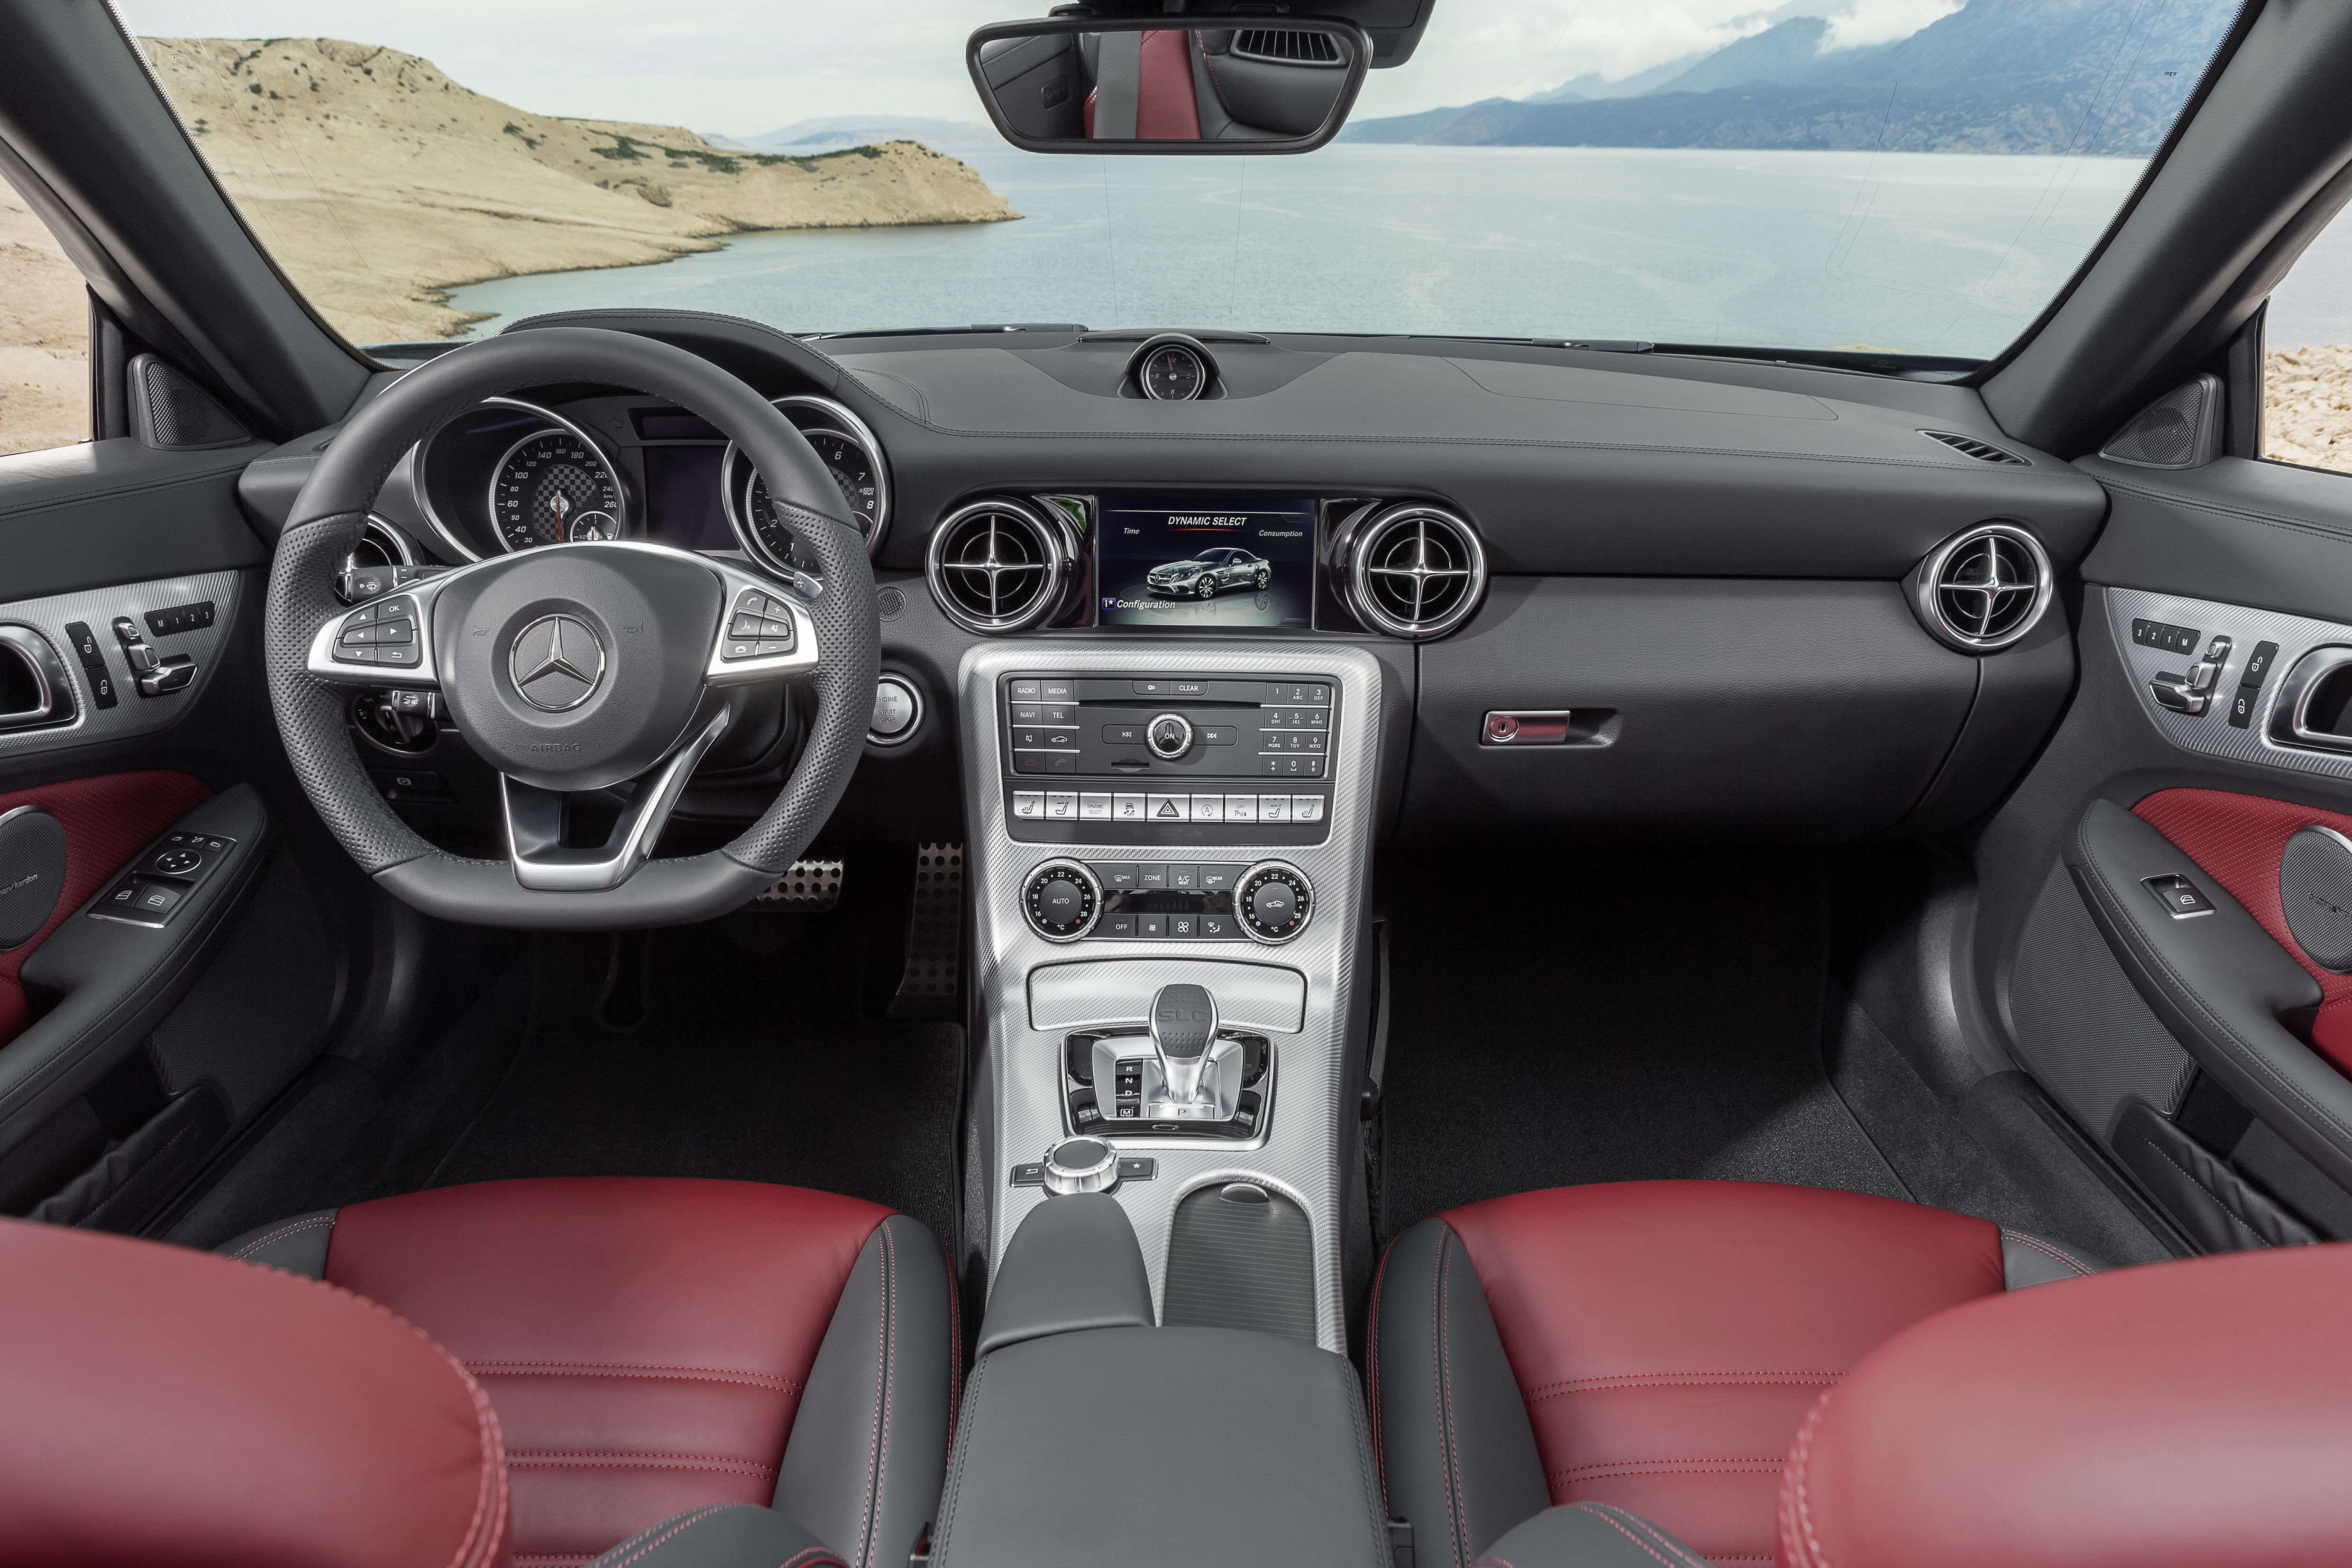 Mercedes-Benz SLC 300, Interieur, bengalrot/schwarz Mercedes-Benz SLC 300, interior, bengal red/black